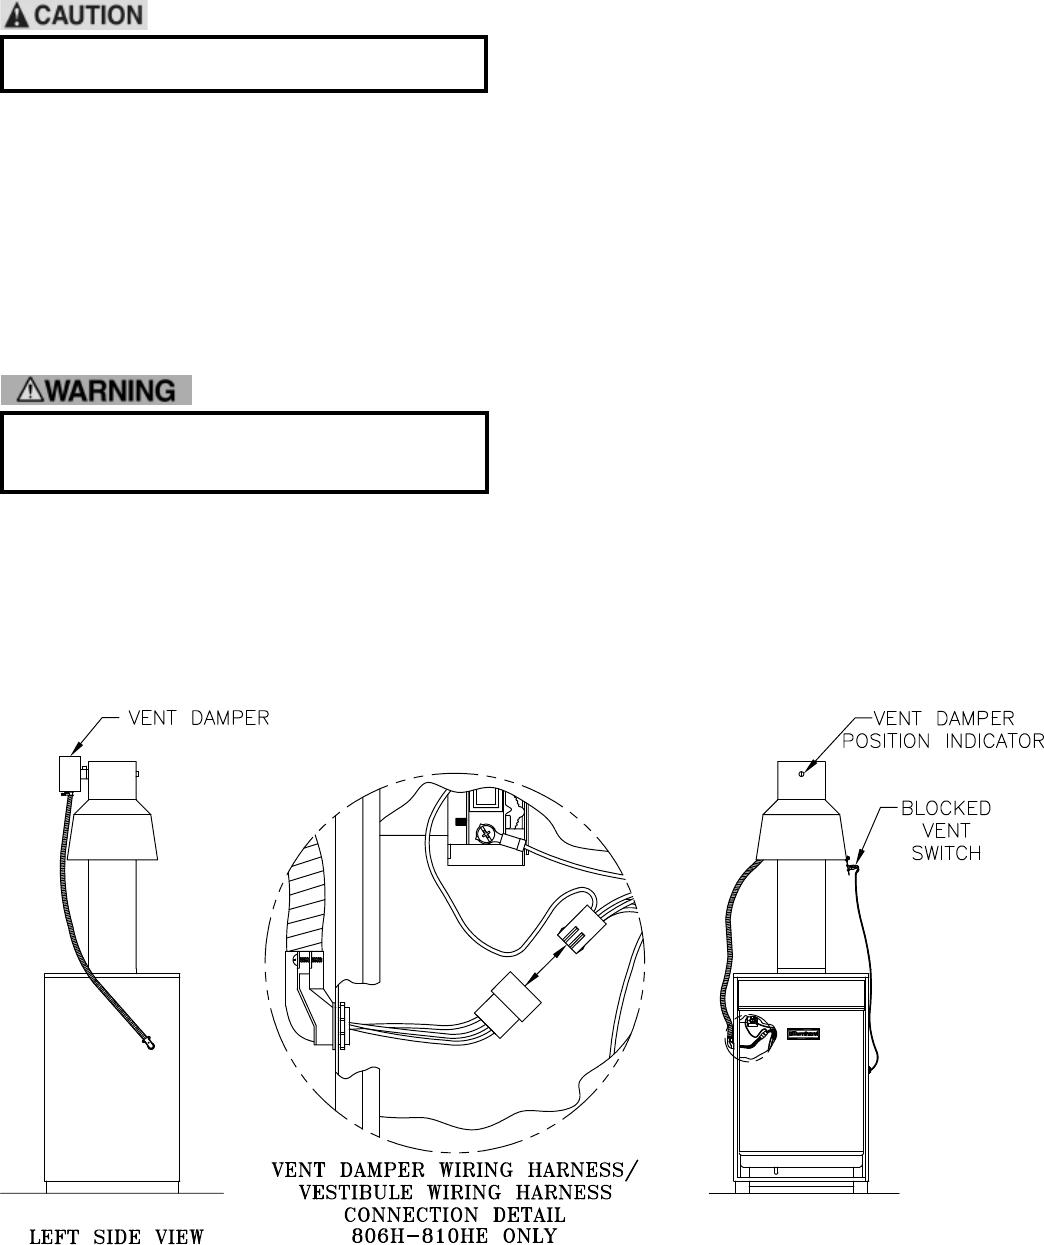 Burnham Series 8h 8he Boiler Installation And Operation Manual Vent Damper Wiring Diagram 31